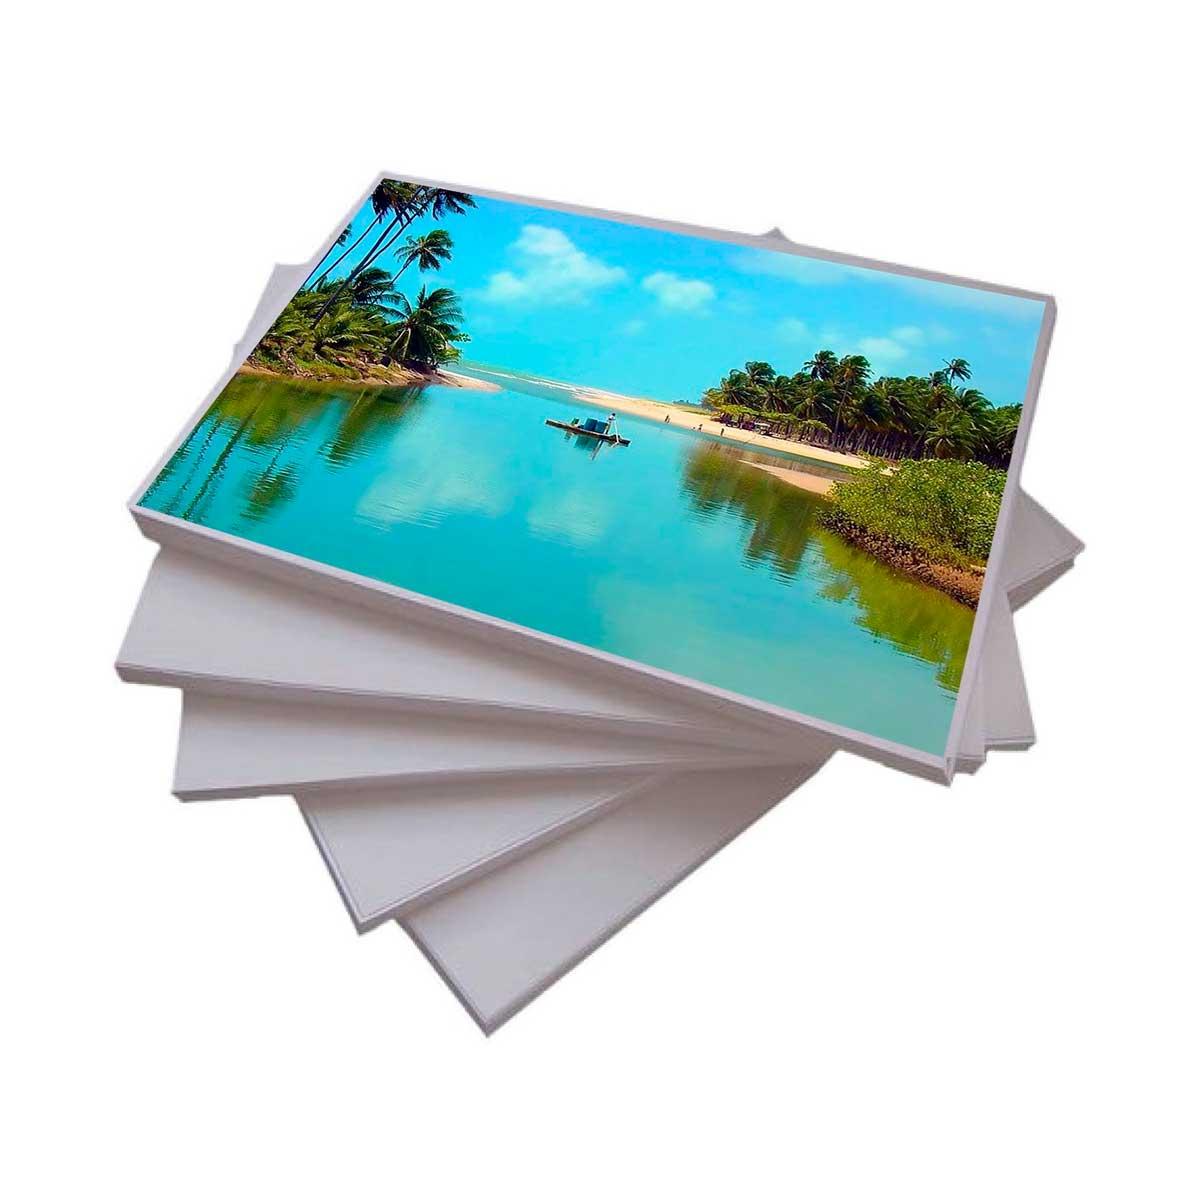 Papel Fotográfico Neutro 180G A4 - C/ 50 Folhas